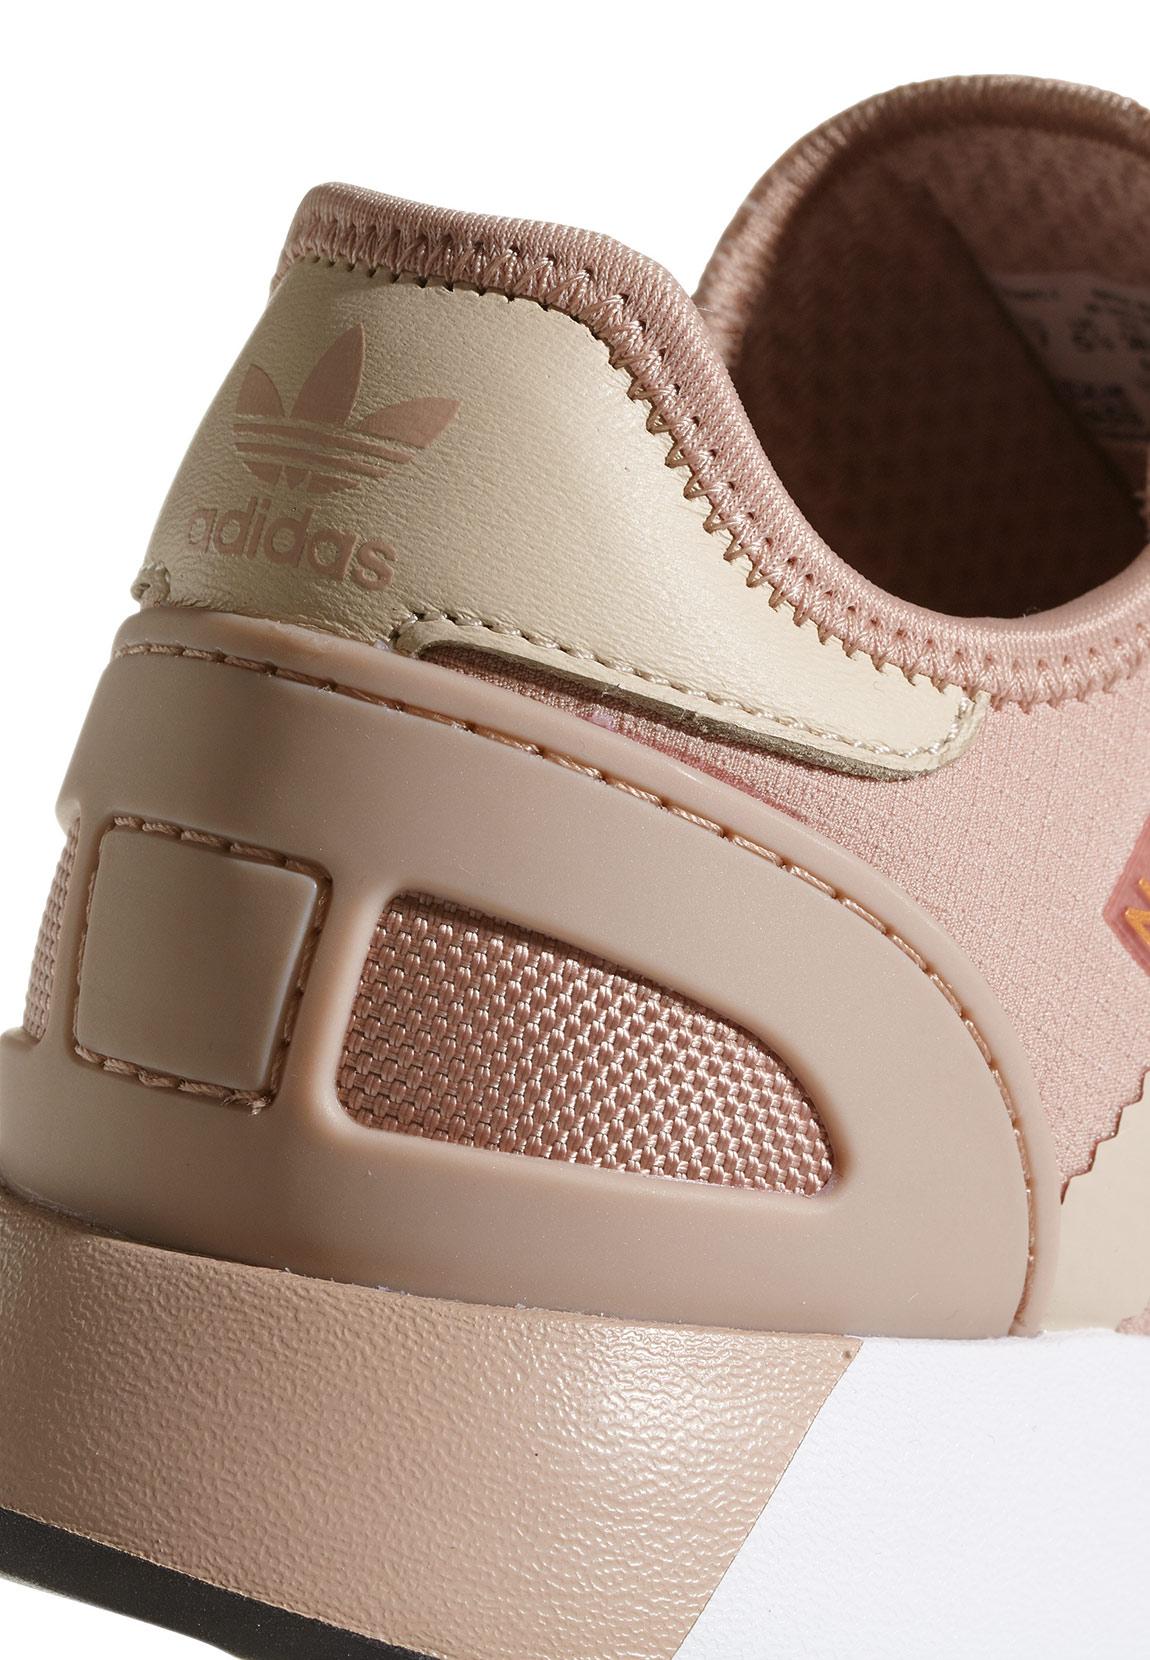 adidas sneaker damen iniki n 5923 w aq0265 rosa schuhe damen. Black Bedroom Furniture Sets. Home Design Ideas